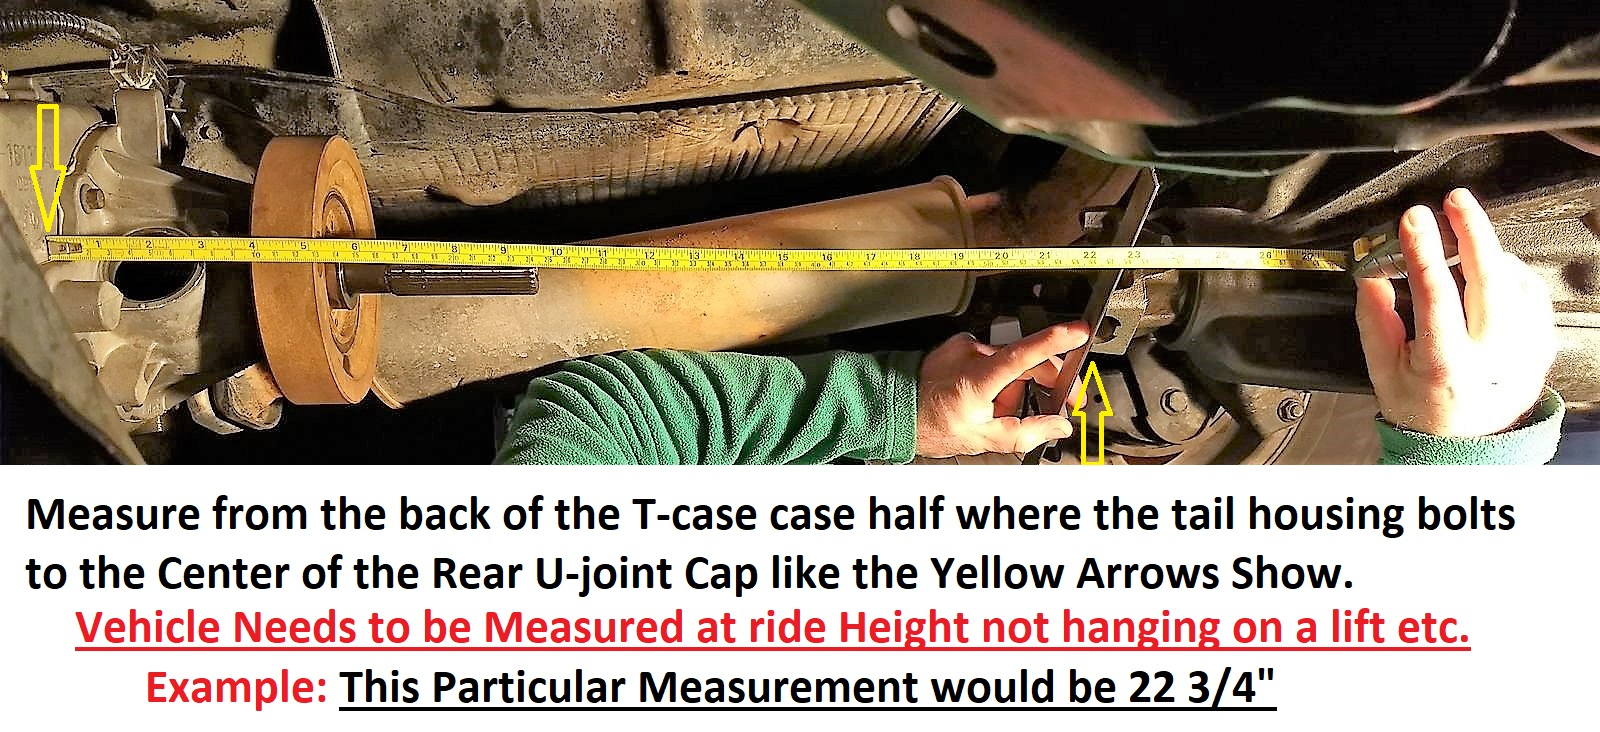 transfer-case-to-center-of-rear-u-joint..jpg